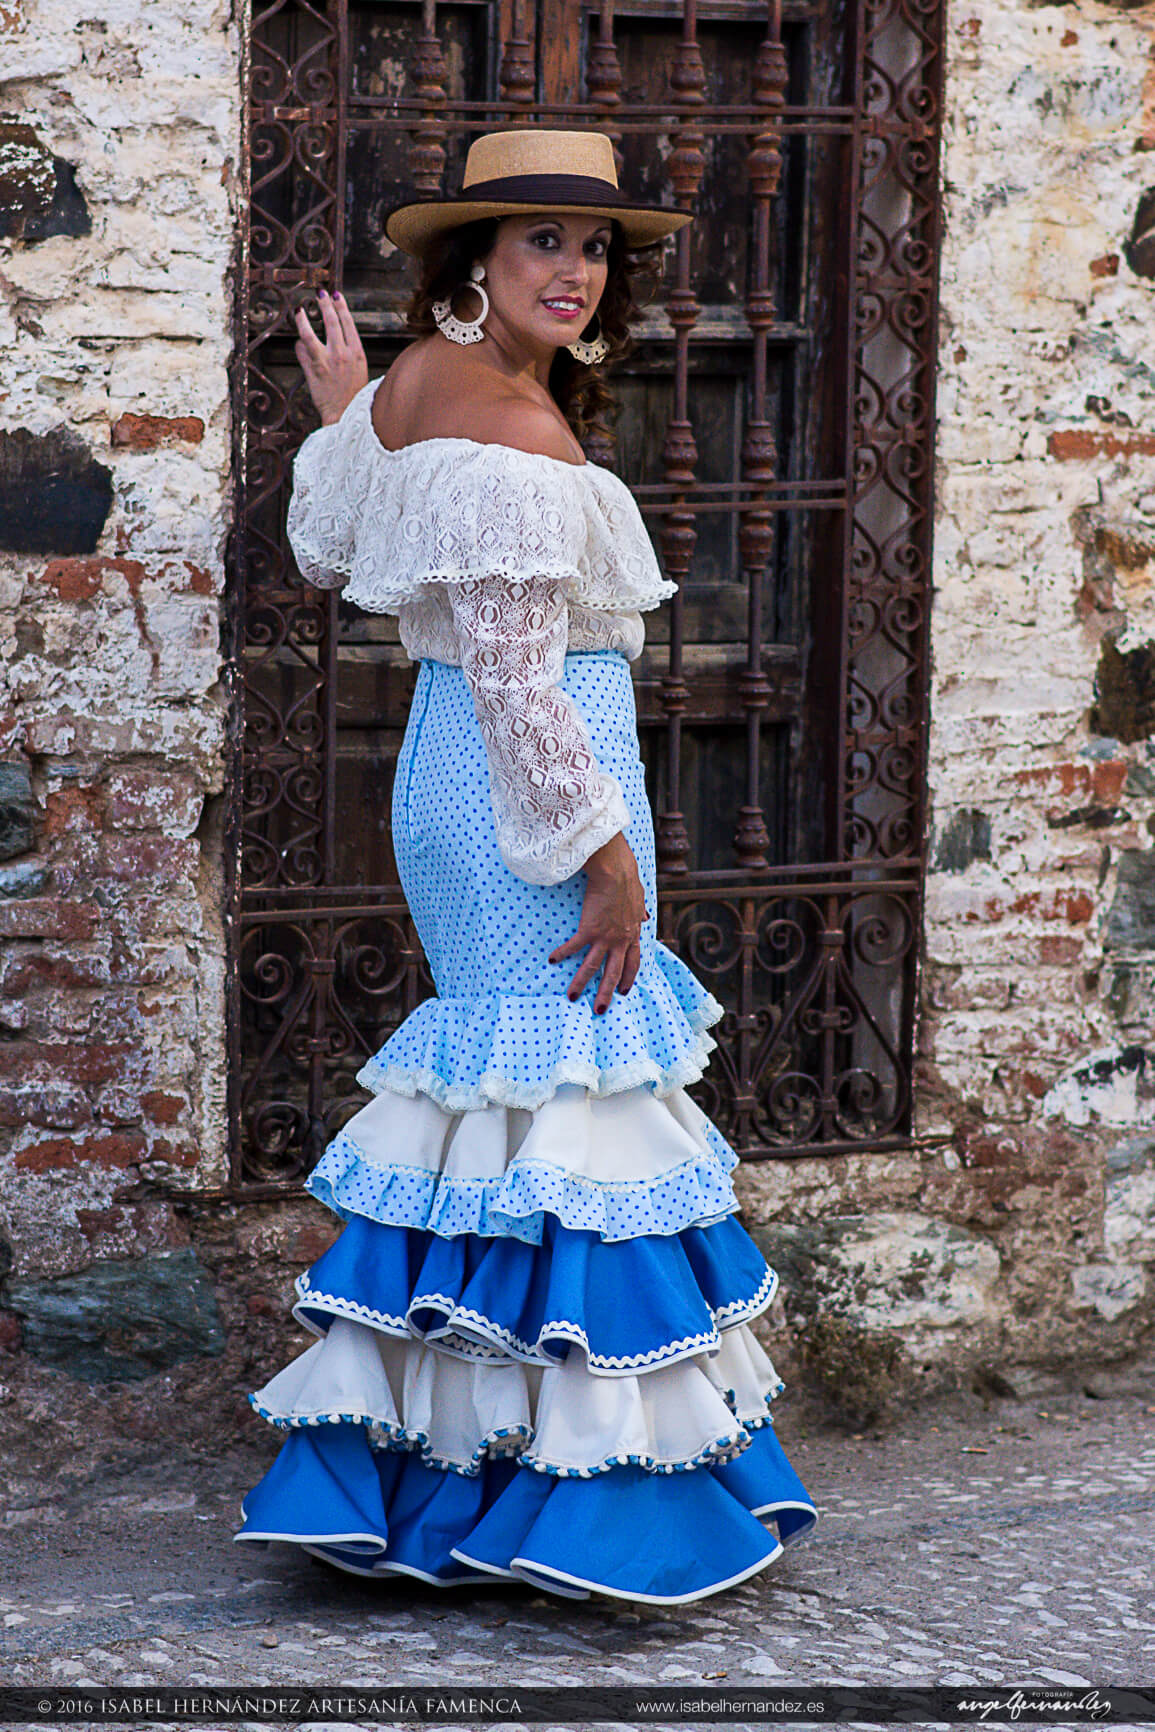 accd082ec Faldas Flamencas económicas Isabel Hernandez Artesania Flamenca